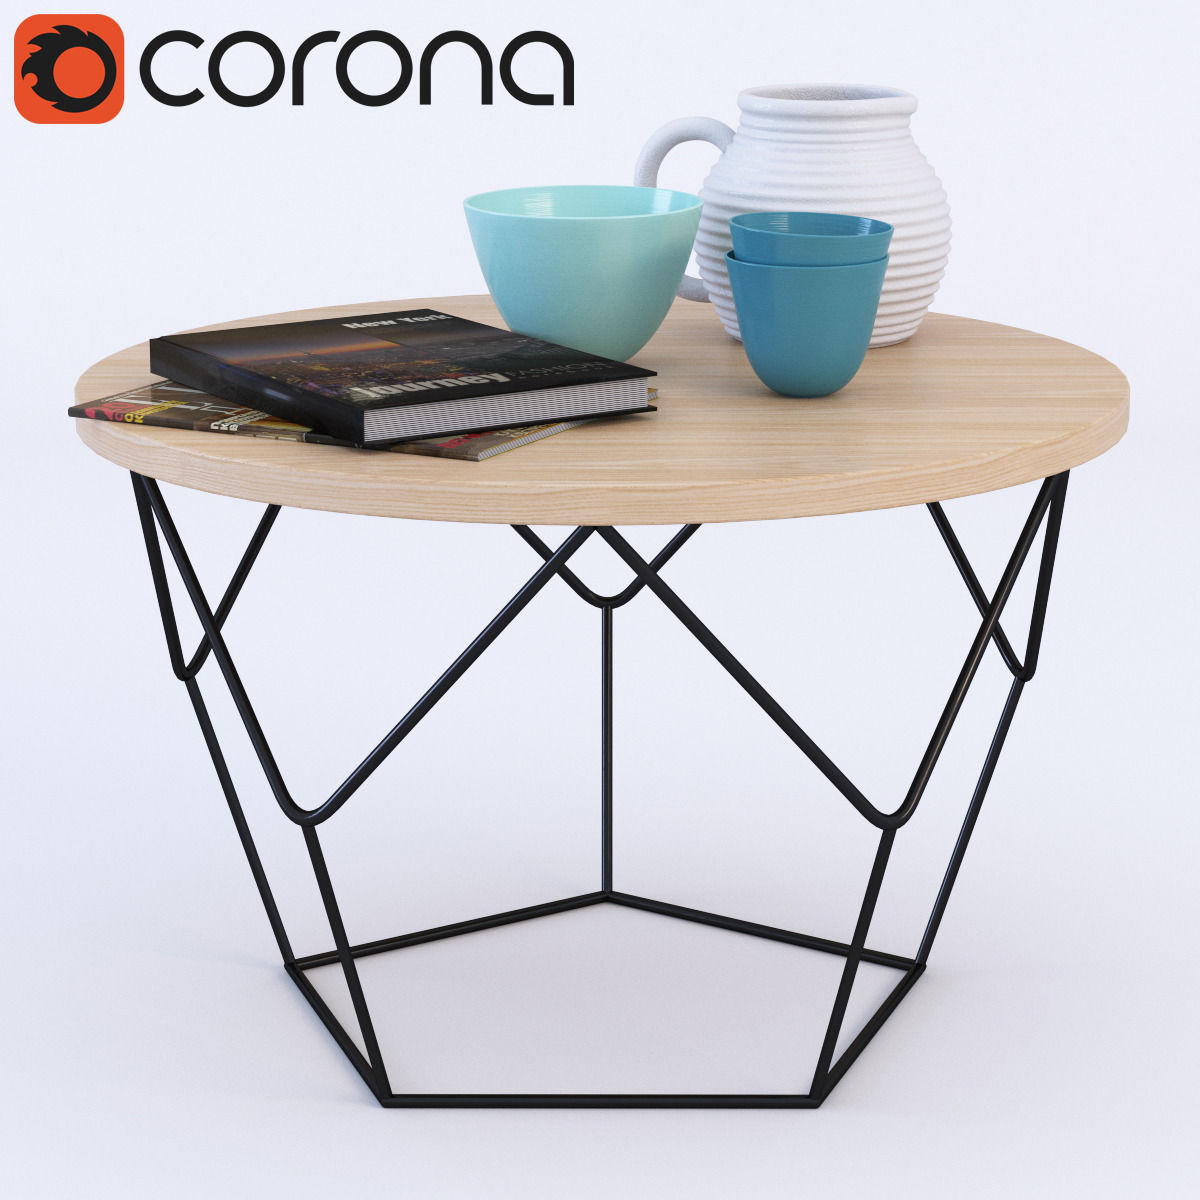 west elm origami coffee table 3d model max obj fbx mtl 1 ... - West Elm Origami Coffee Table 3D Model MAX OBJ FBX MTL